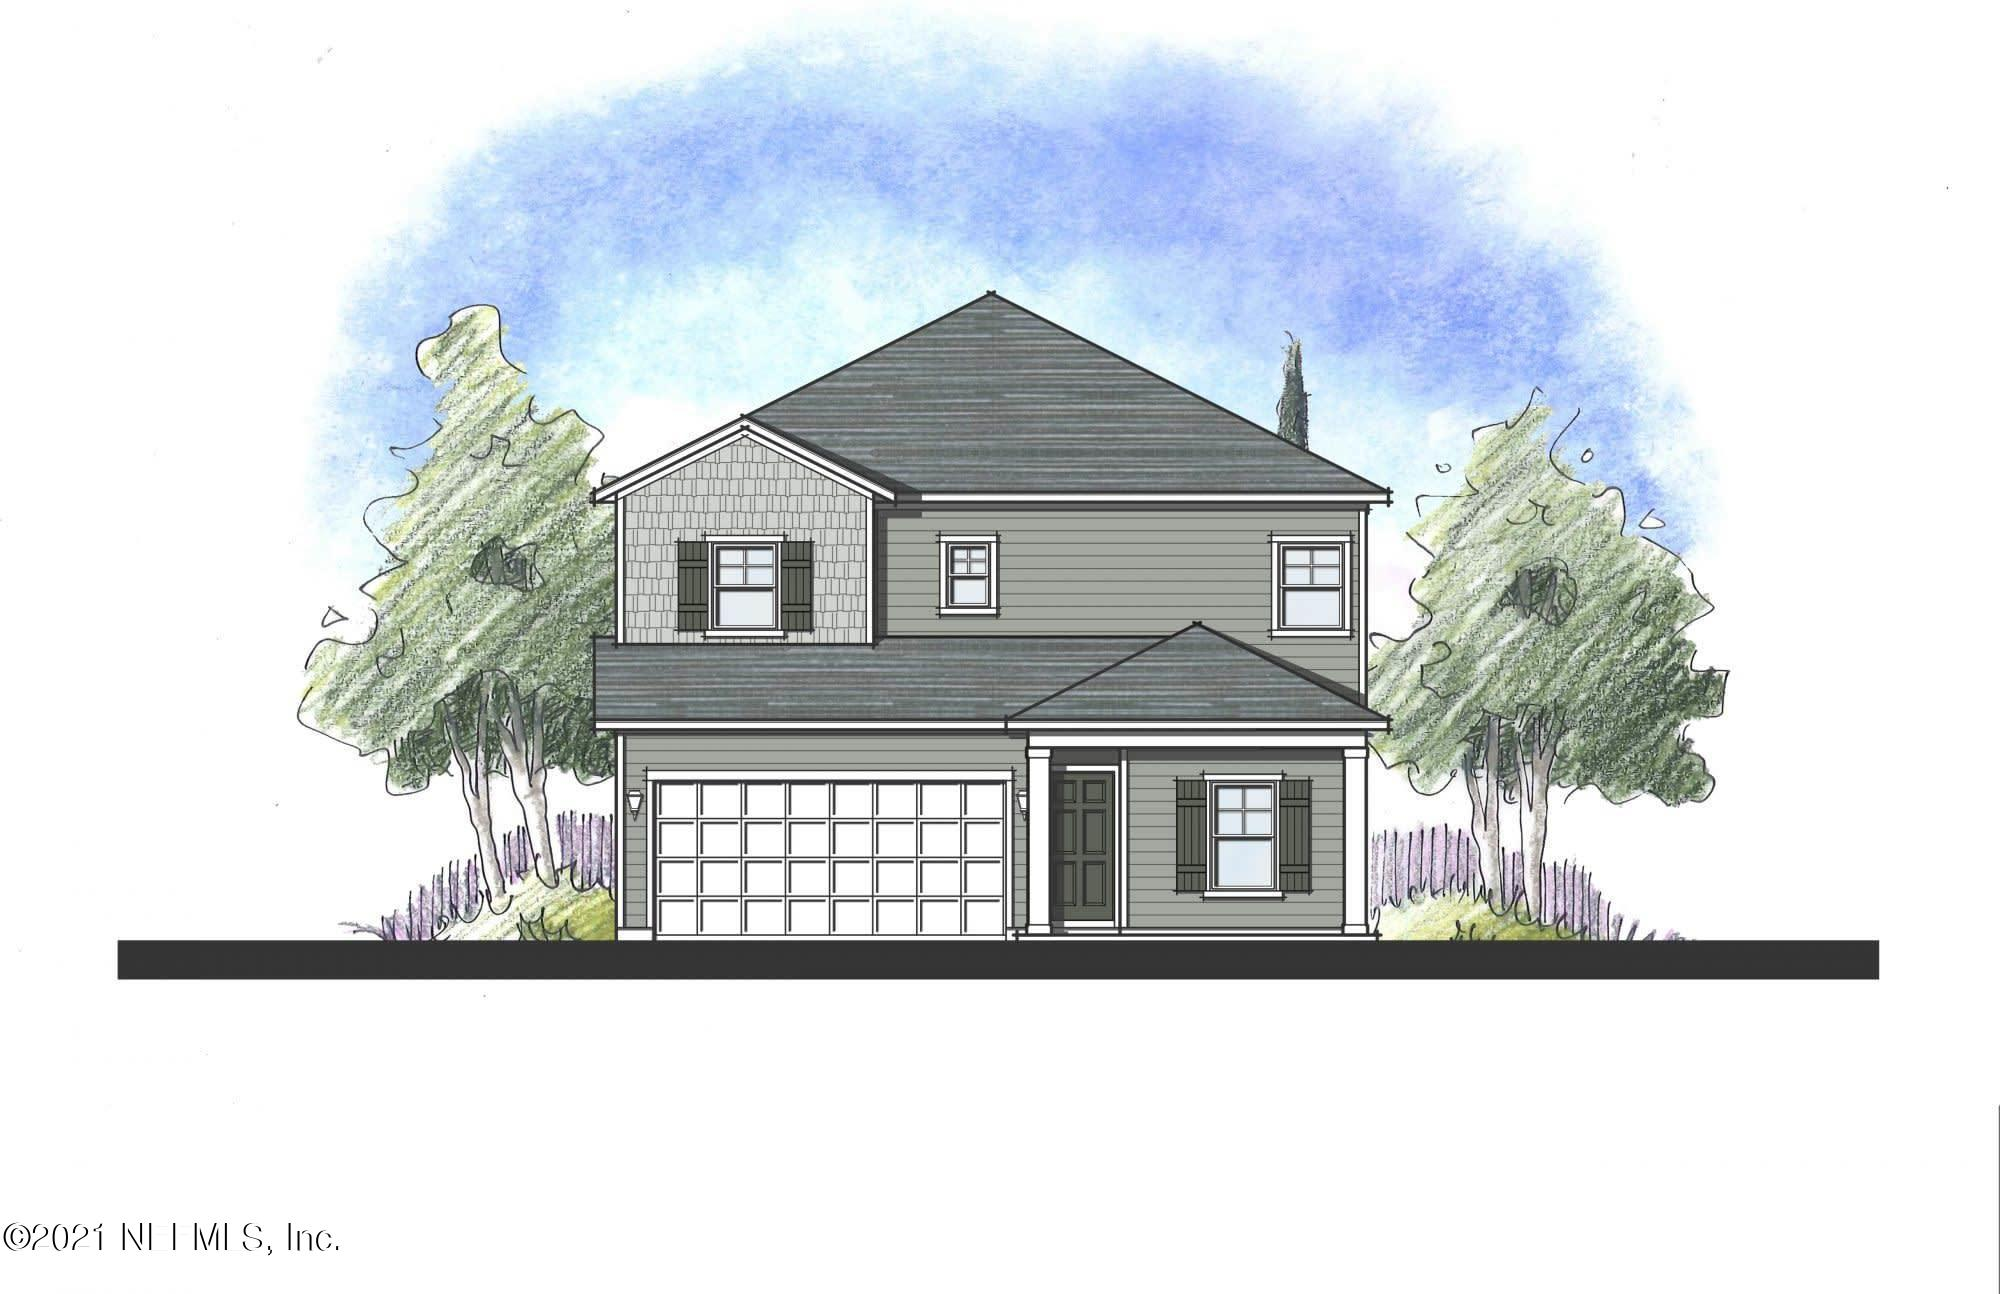 2887 COPPERWOOD, ORANGE PARK, FLORIDA 32073, 4 Bedrooms Bedrooms, ,2 BathroomsBathrooms,Residential,For sale,COPPERWOOD,1097293